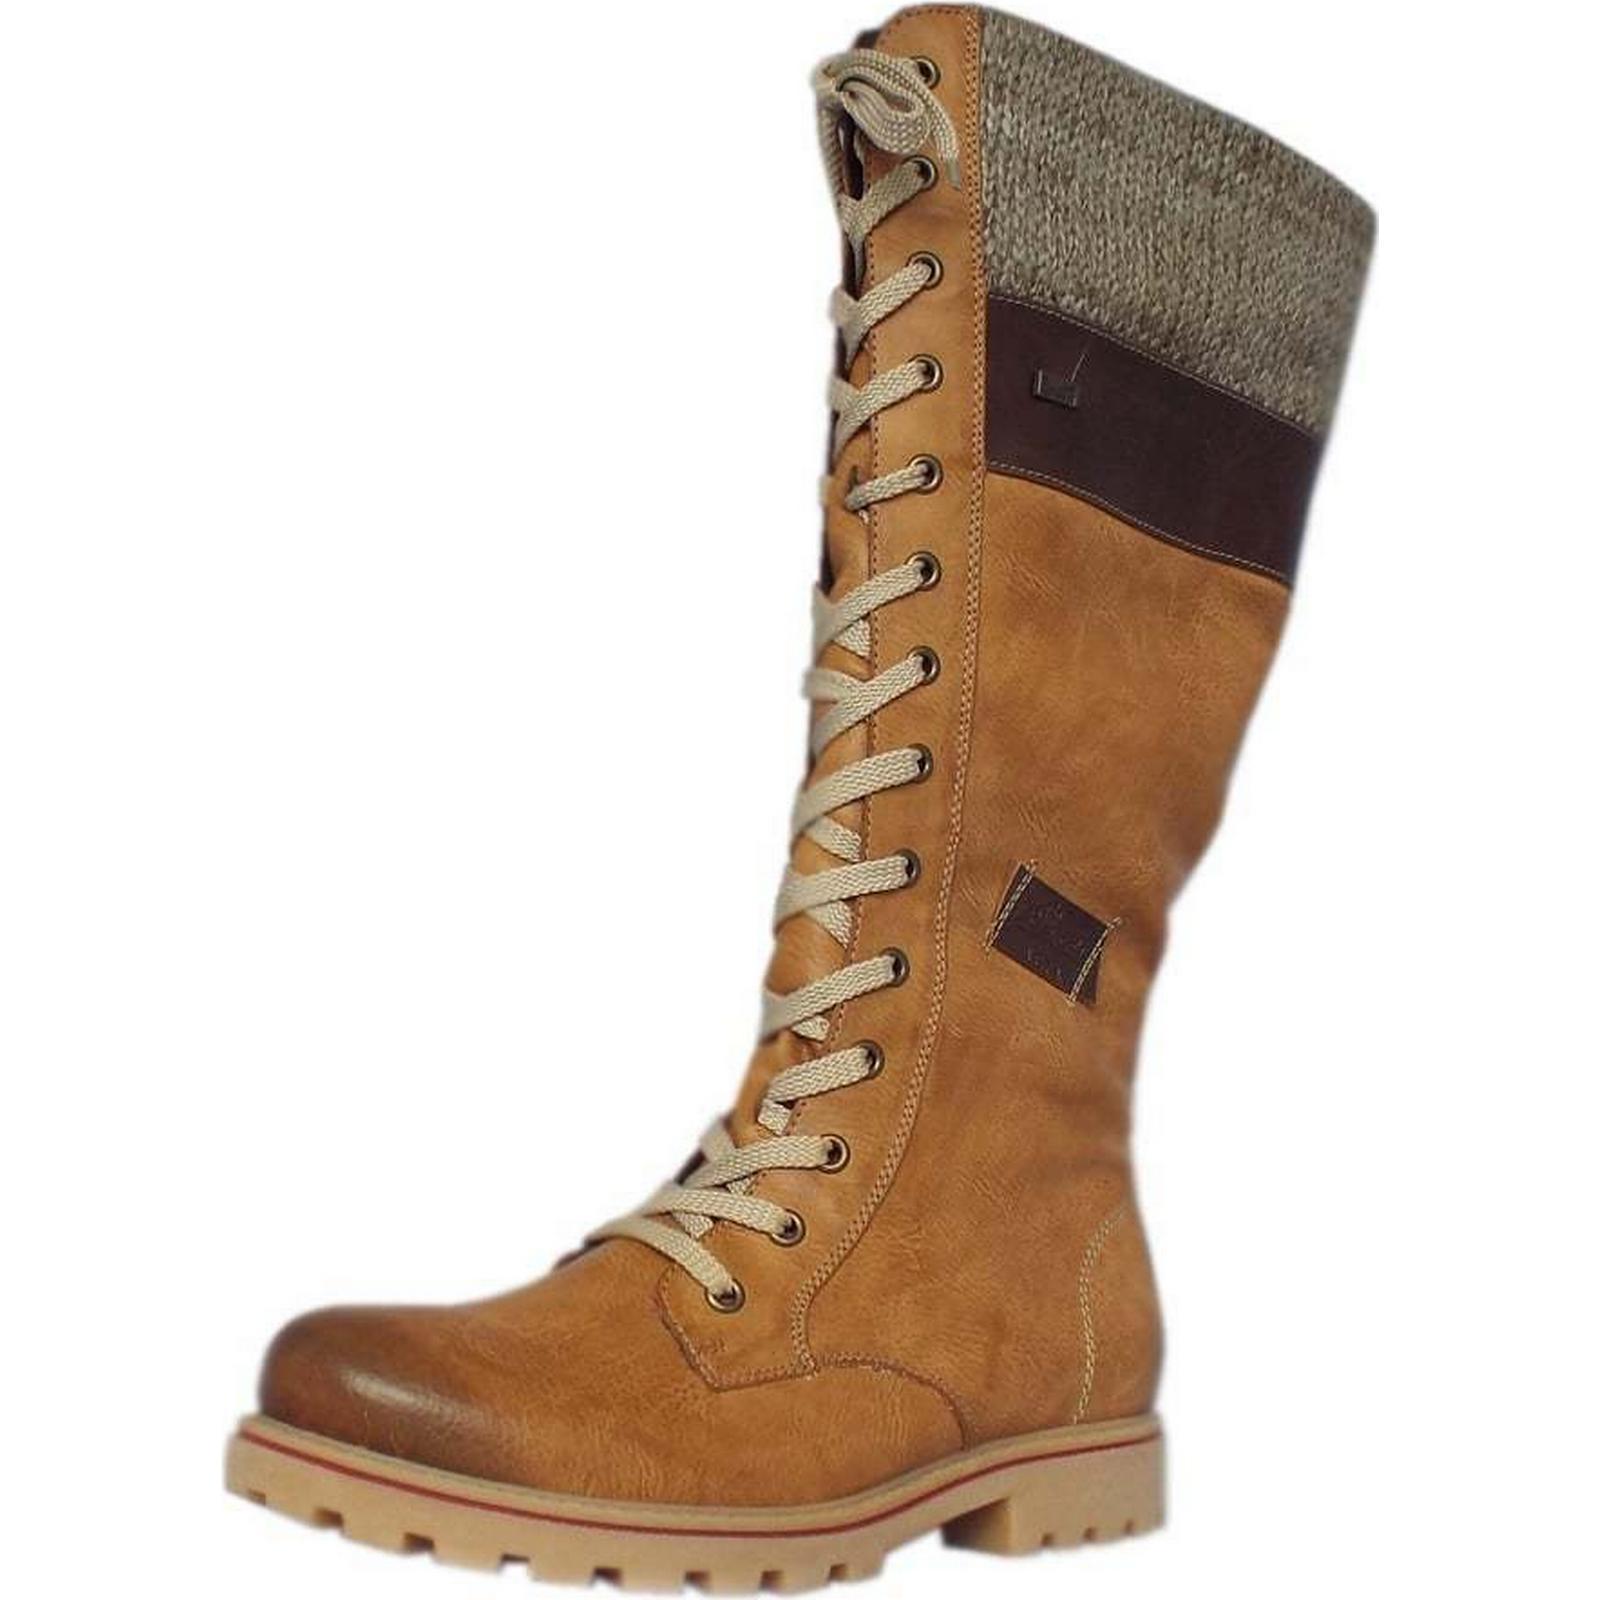 rieker snowboard rieker mesdames longtemps bottes taille: taille: taille: 35, couleur sable f0a24b